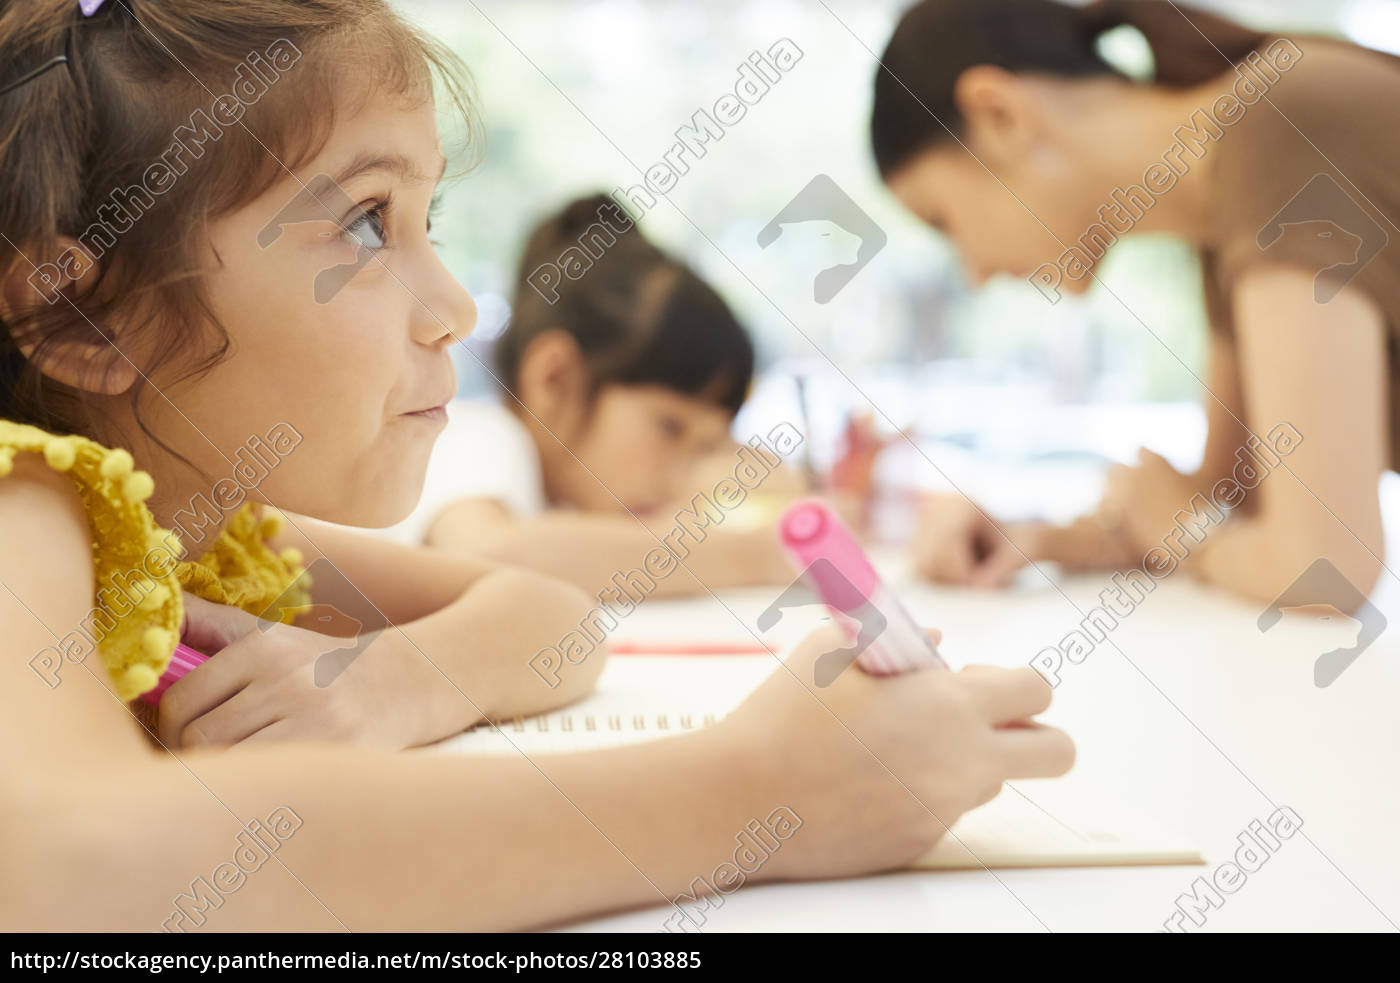 schoolchild, school, life - 28103885